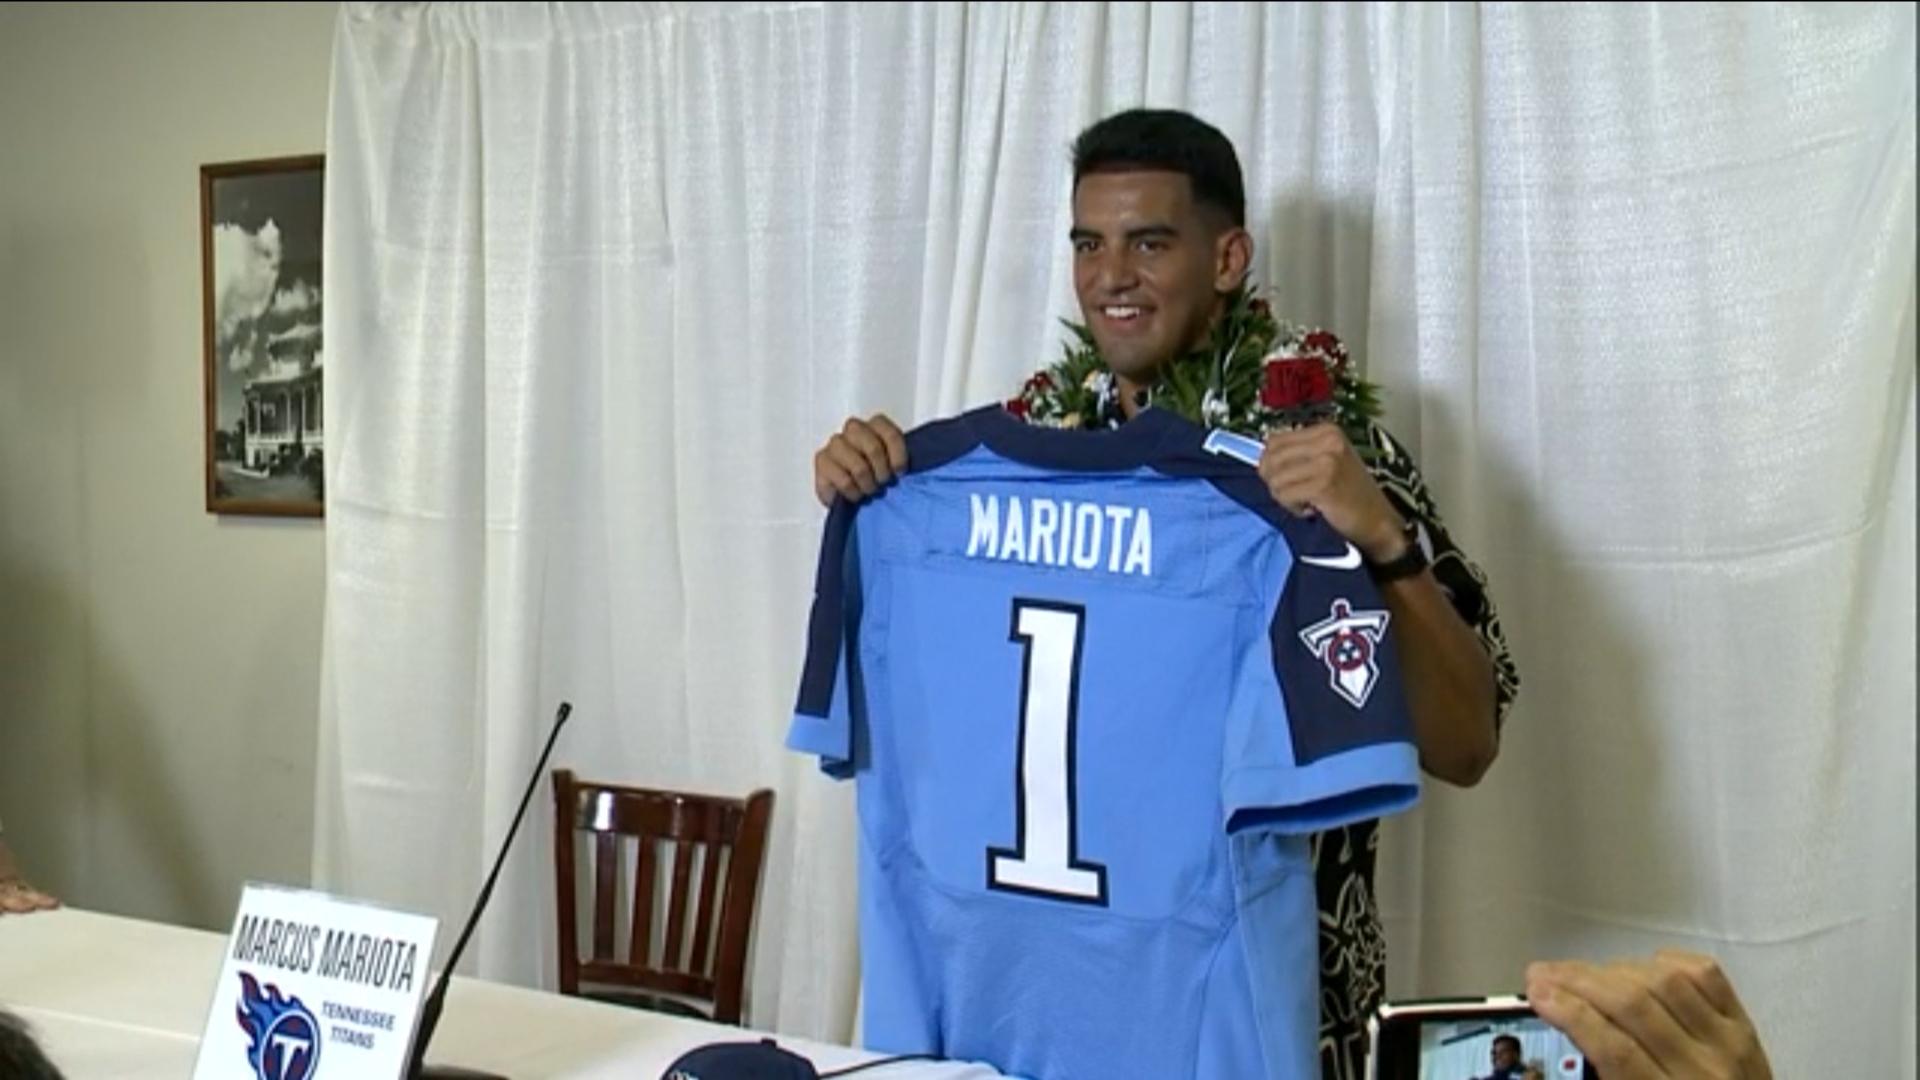 MARCUS MARIOTA PRESS CONFERENCE 2_92147